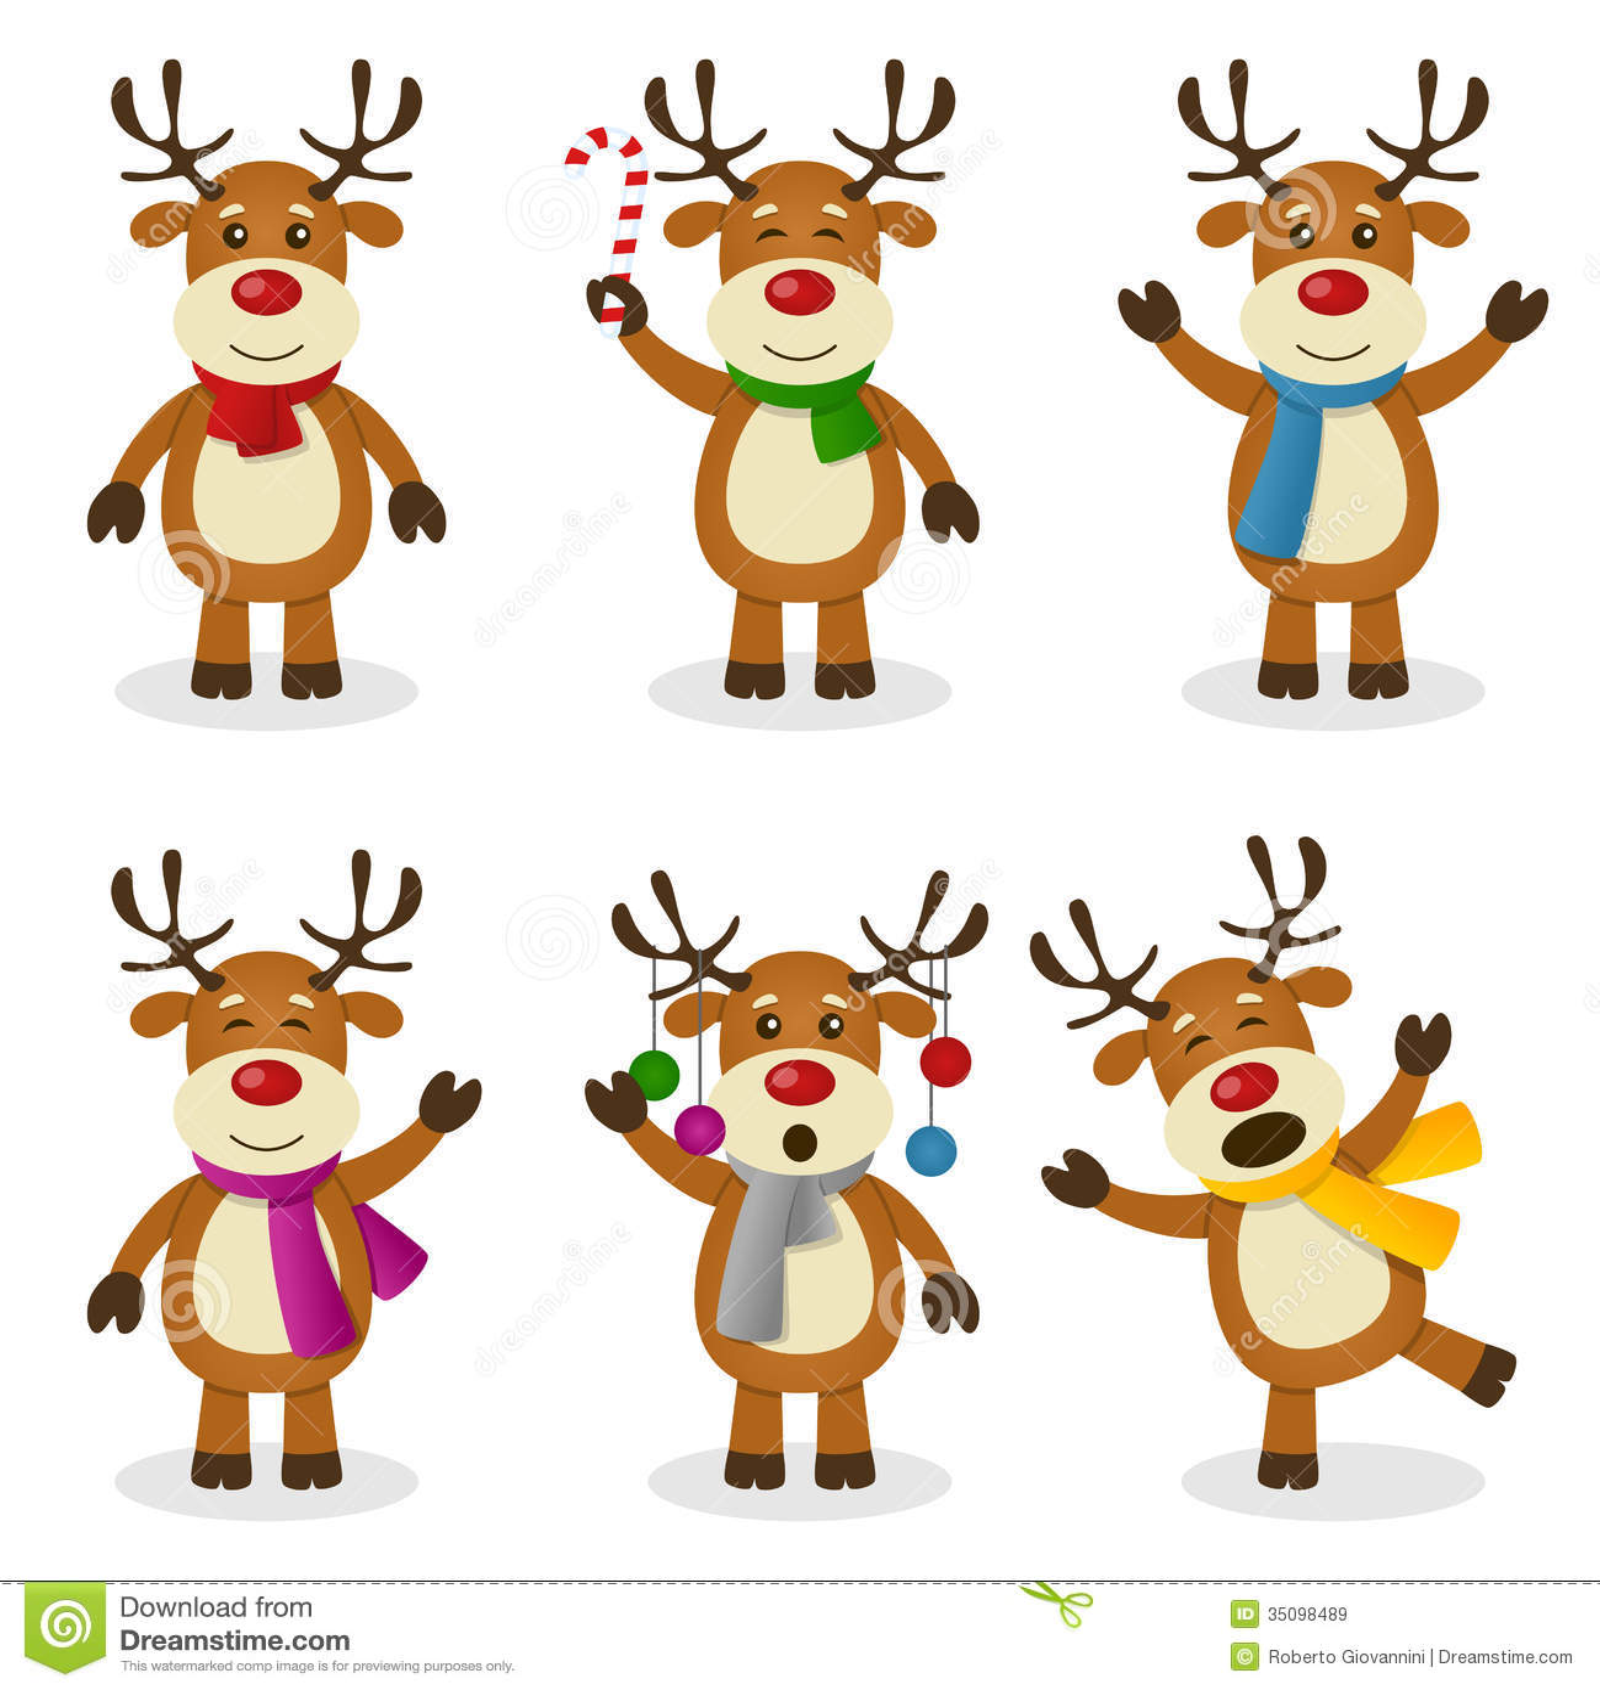 Reindeer Cartoon Christmas Set Royalty Free Stock Images